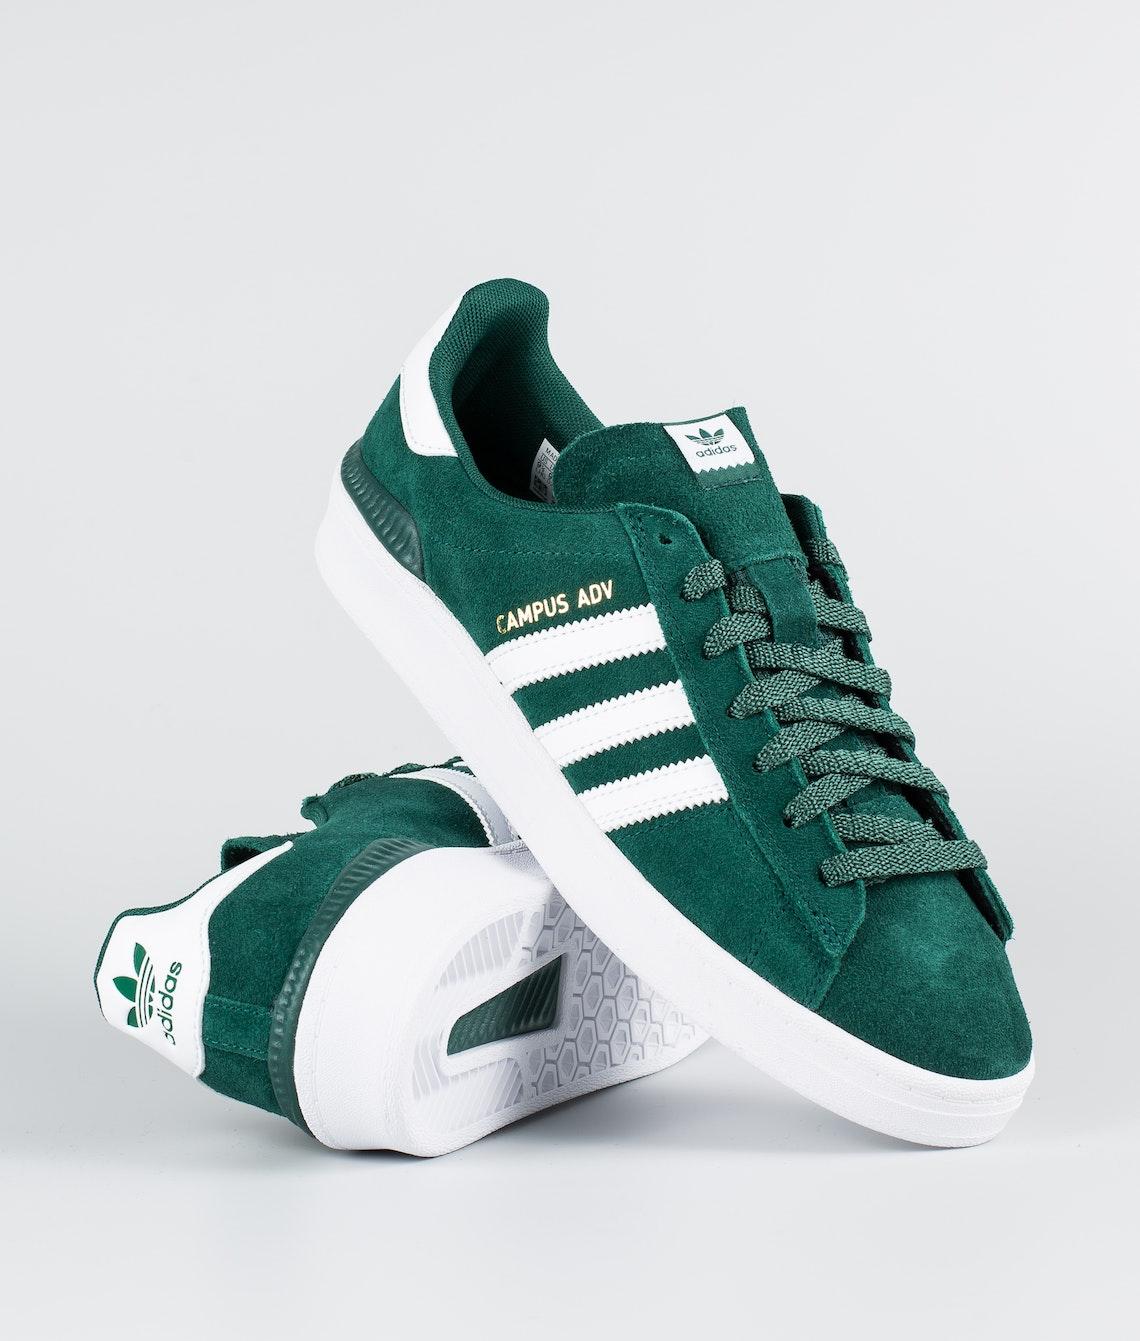 Adidas Skate Shoes 5